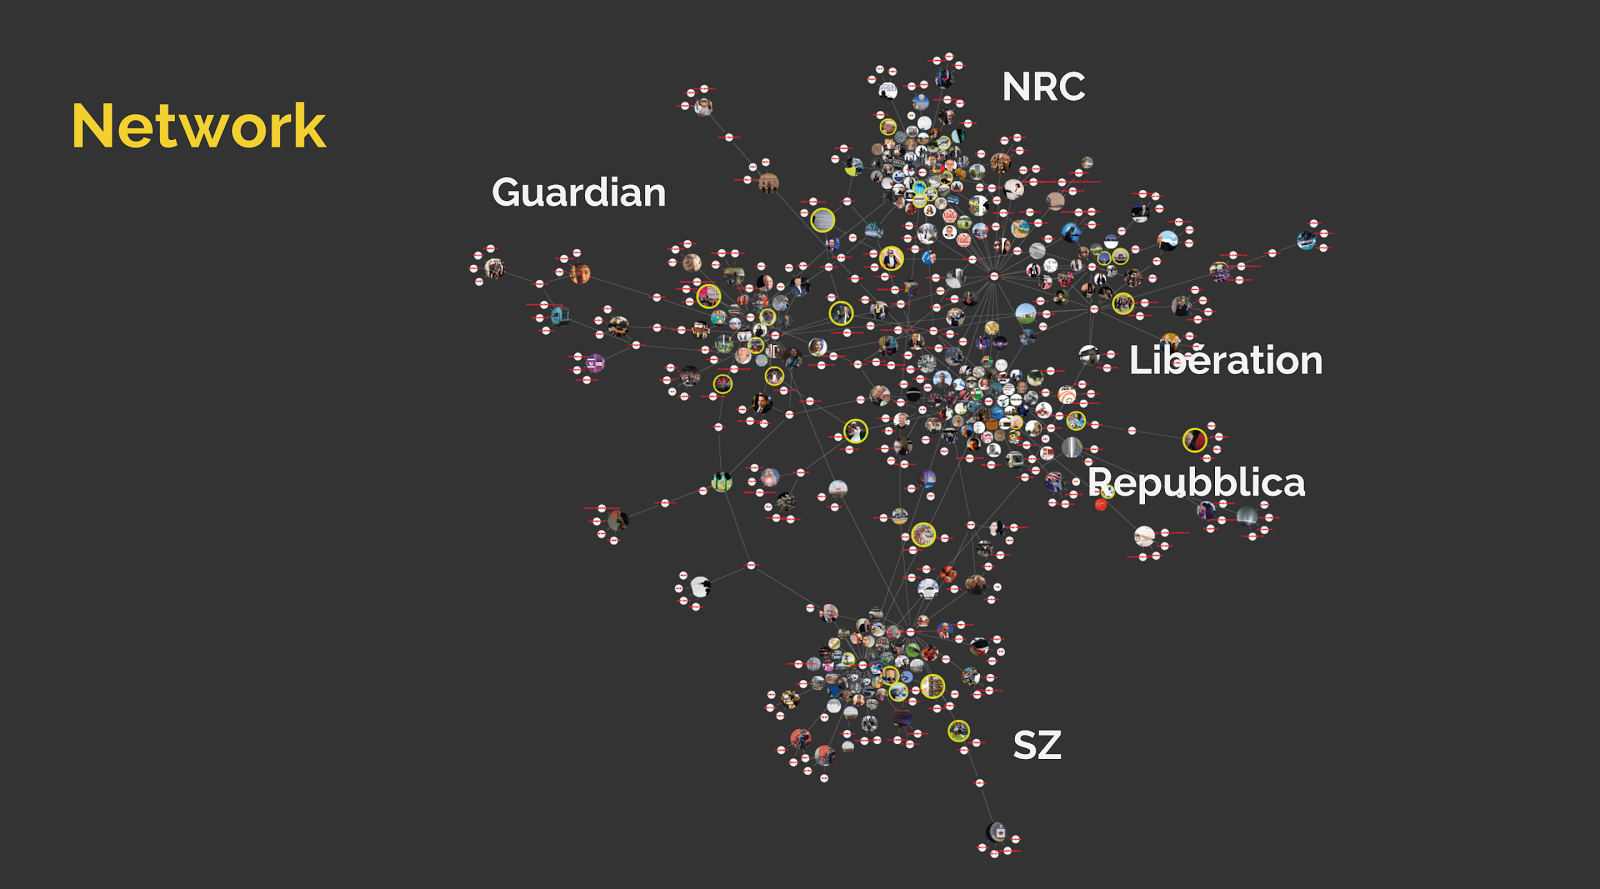 figure_16_network_viz_02.png